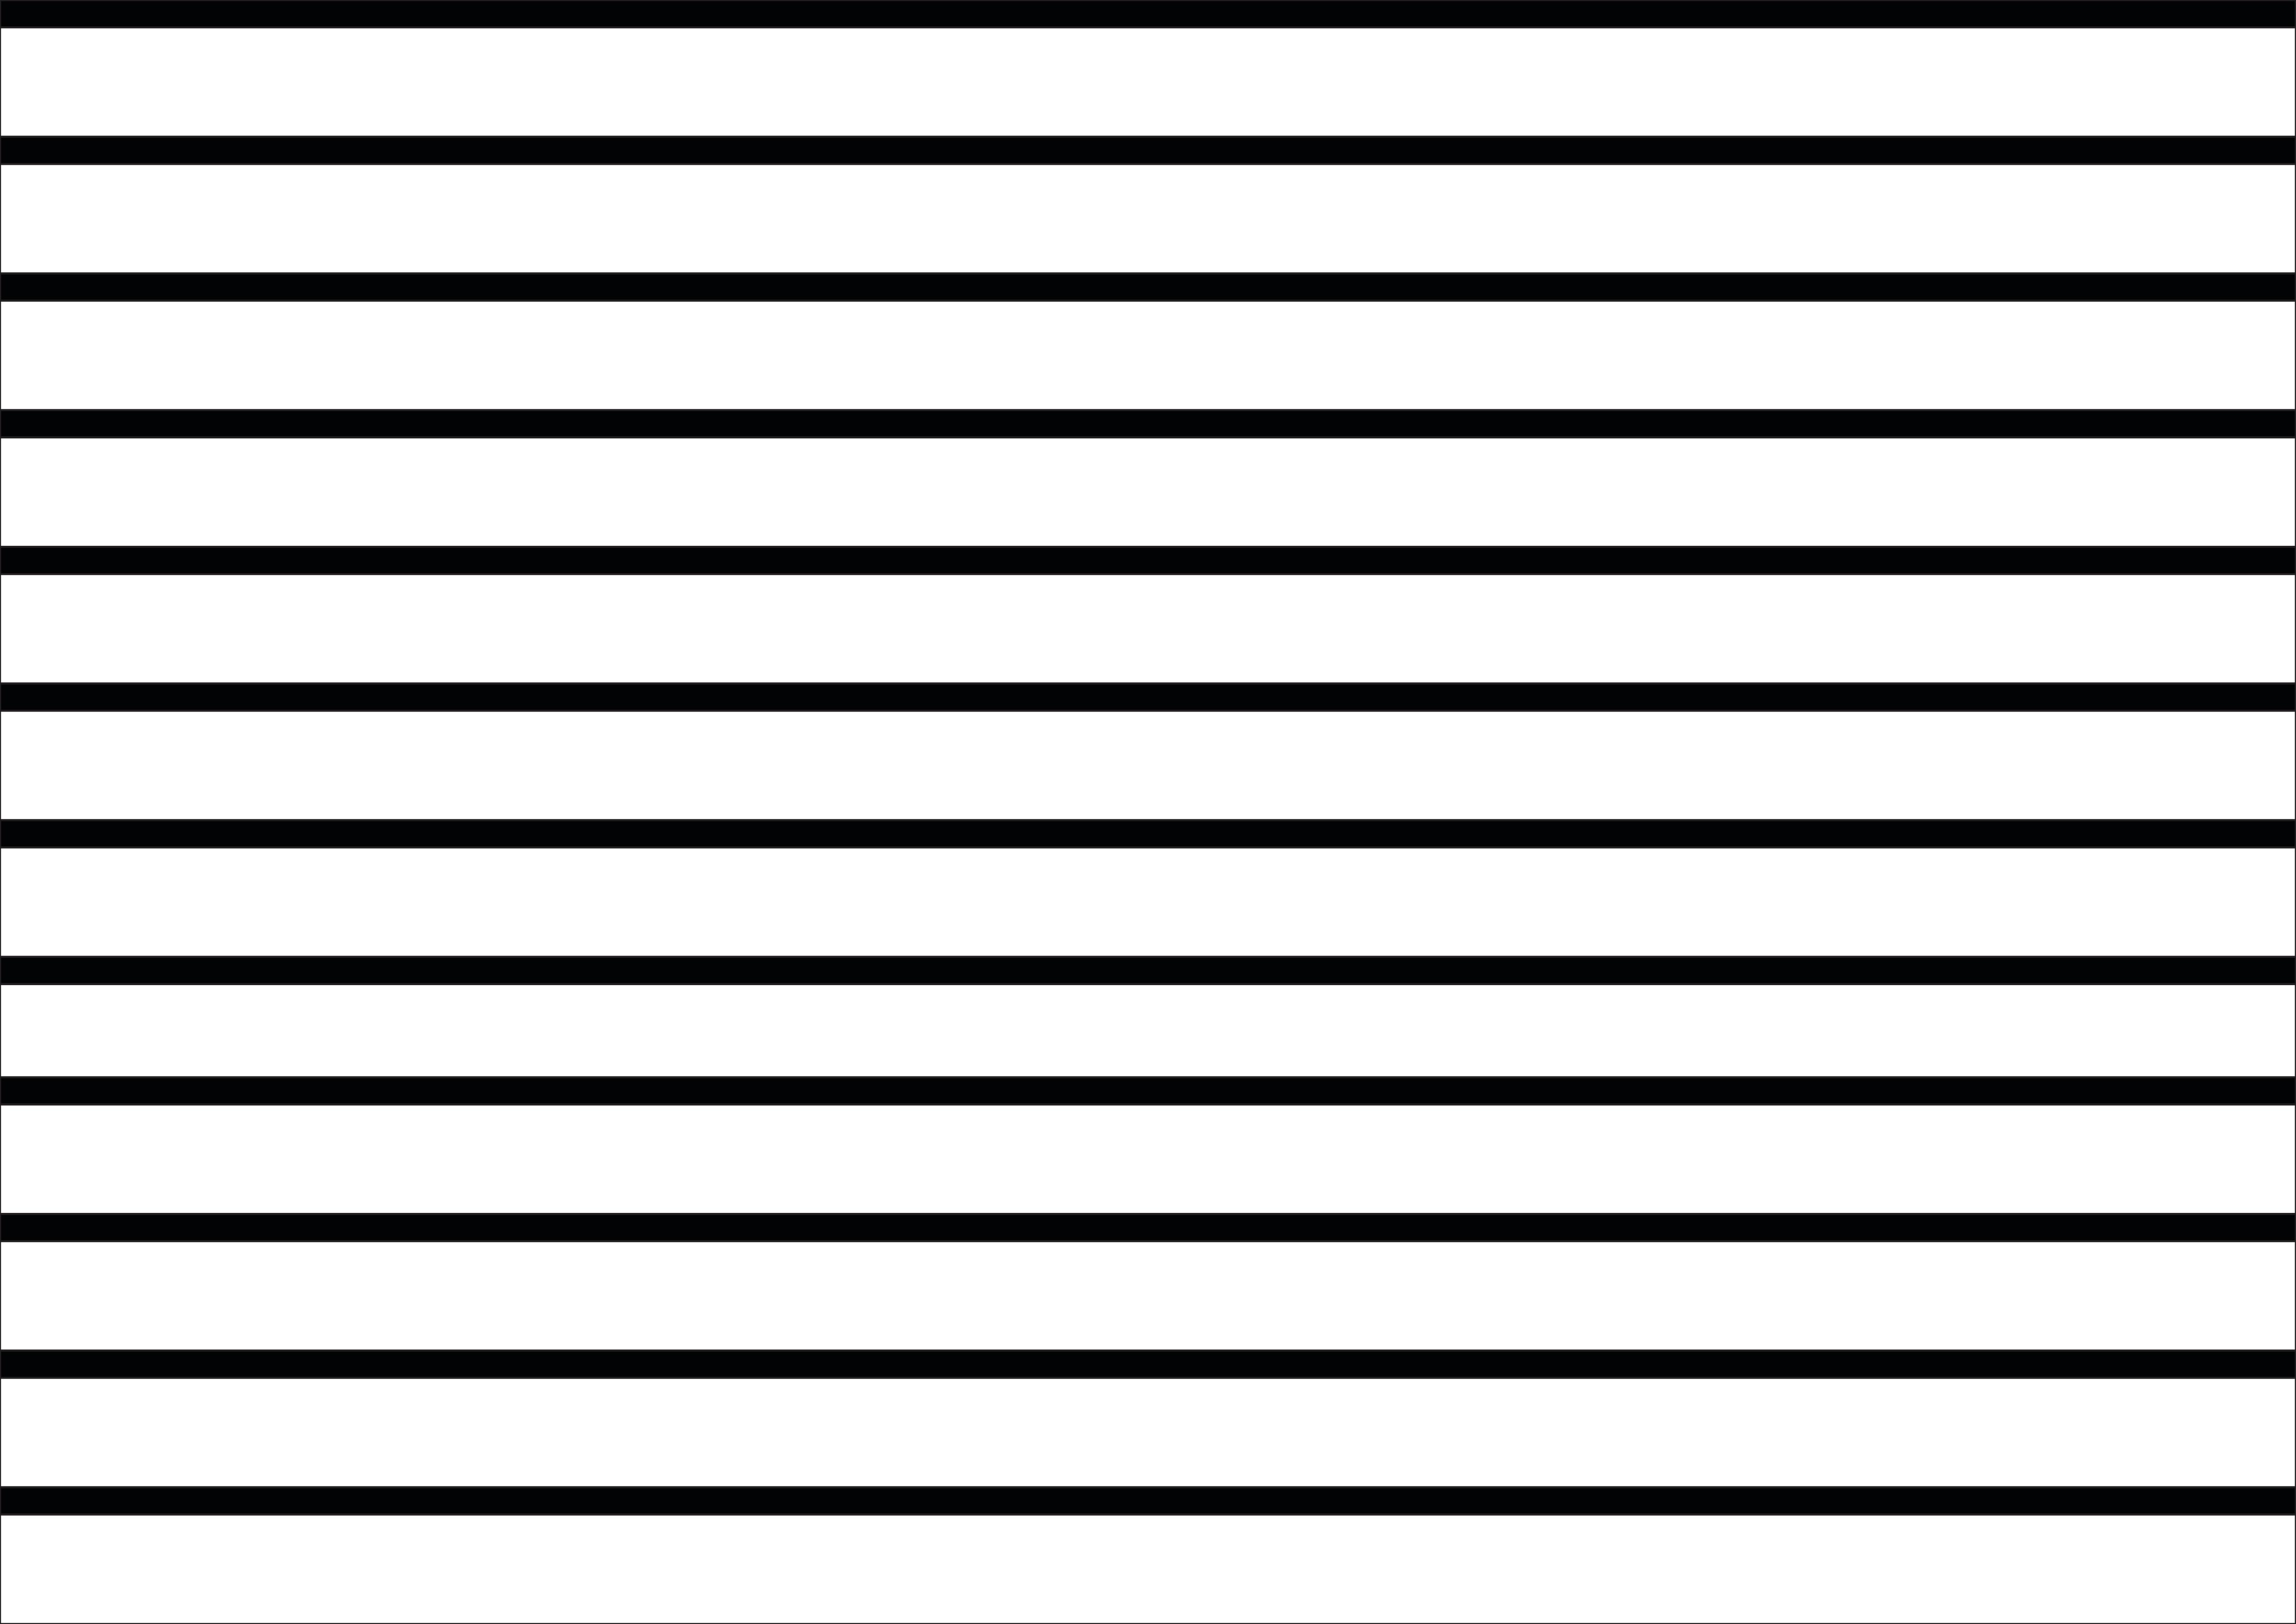 Stripe 3-01